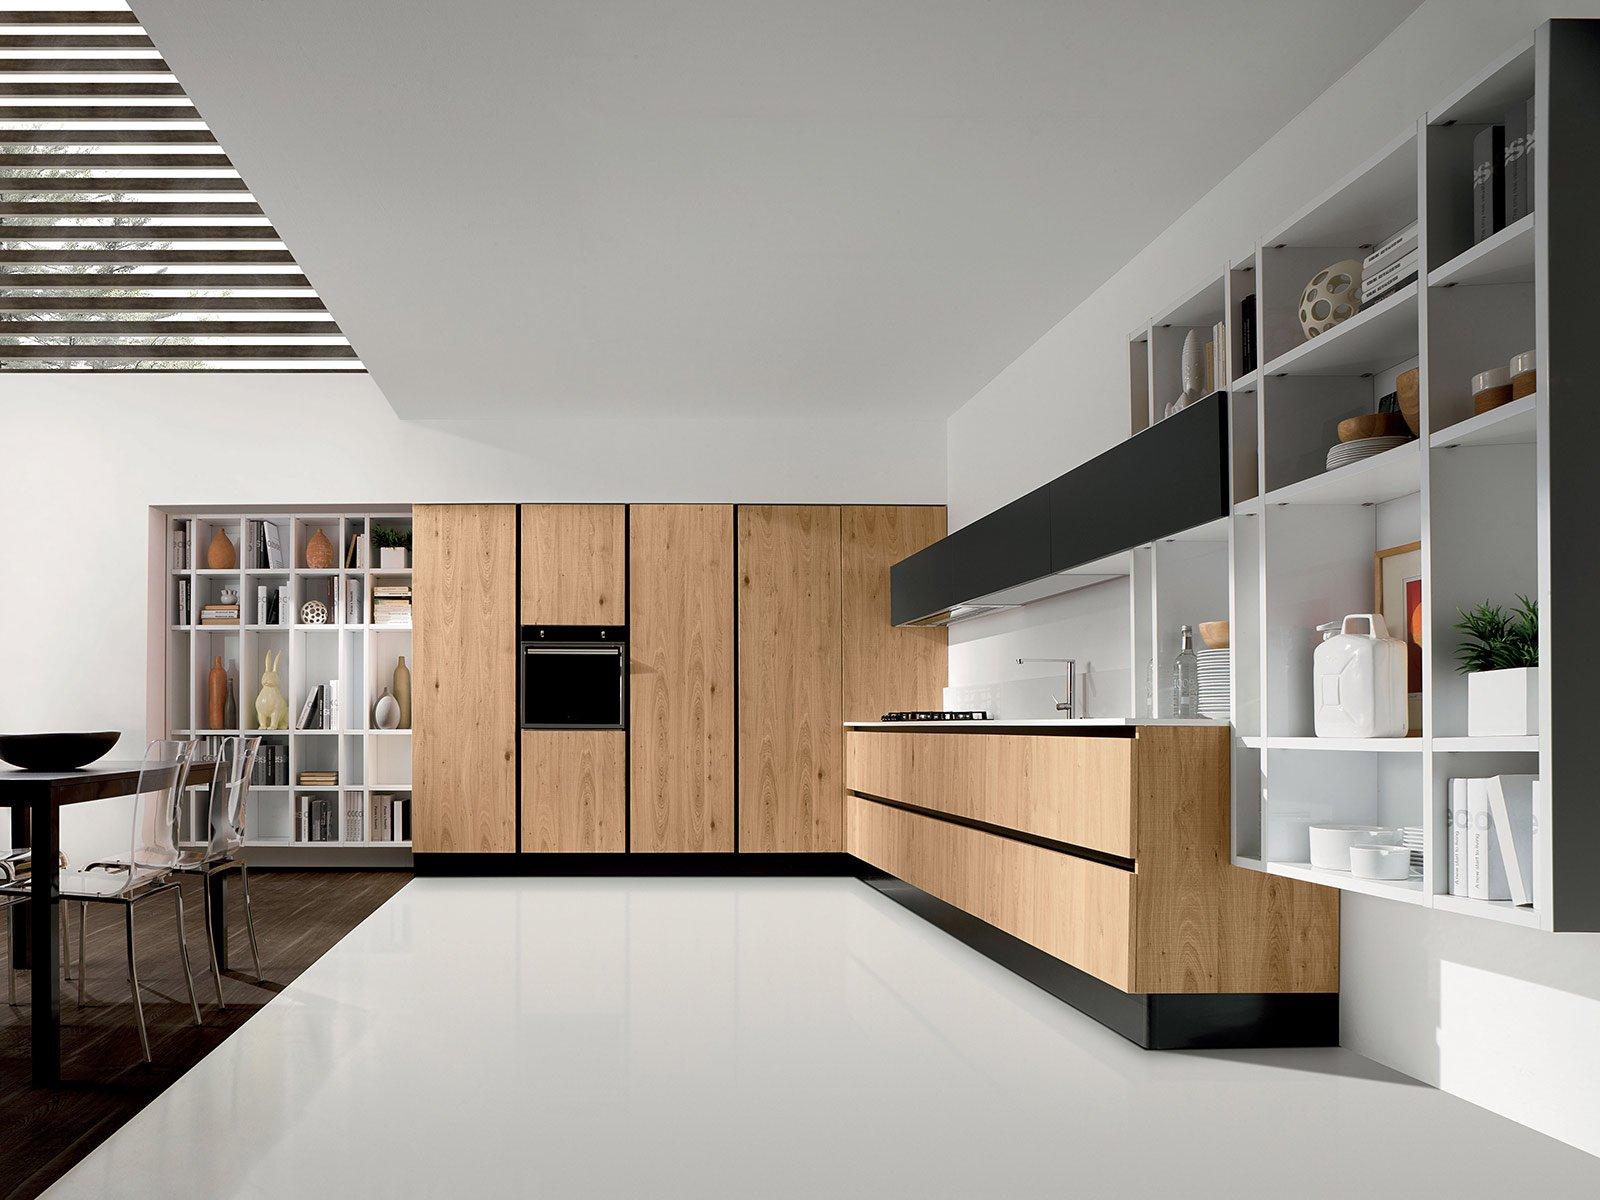 Popolare Cucine moderne in legno - Cose di Casa UE23